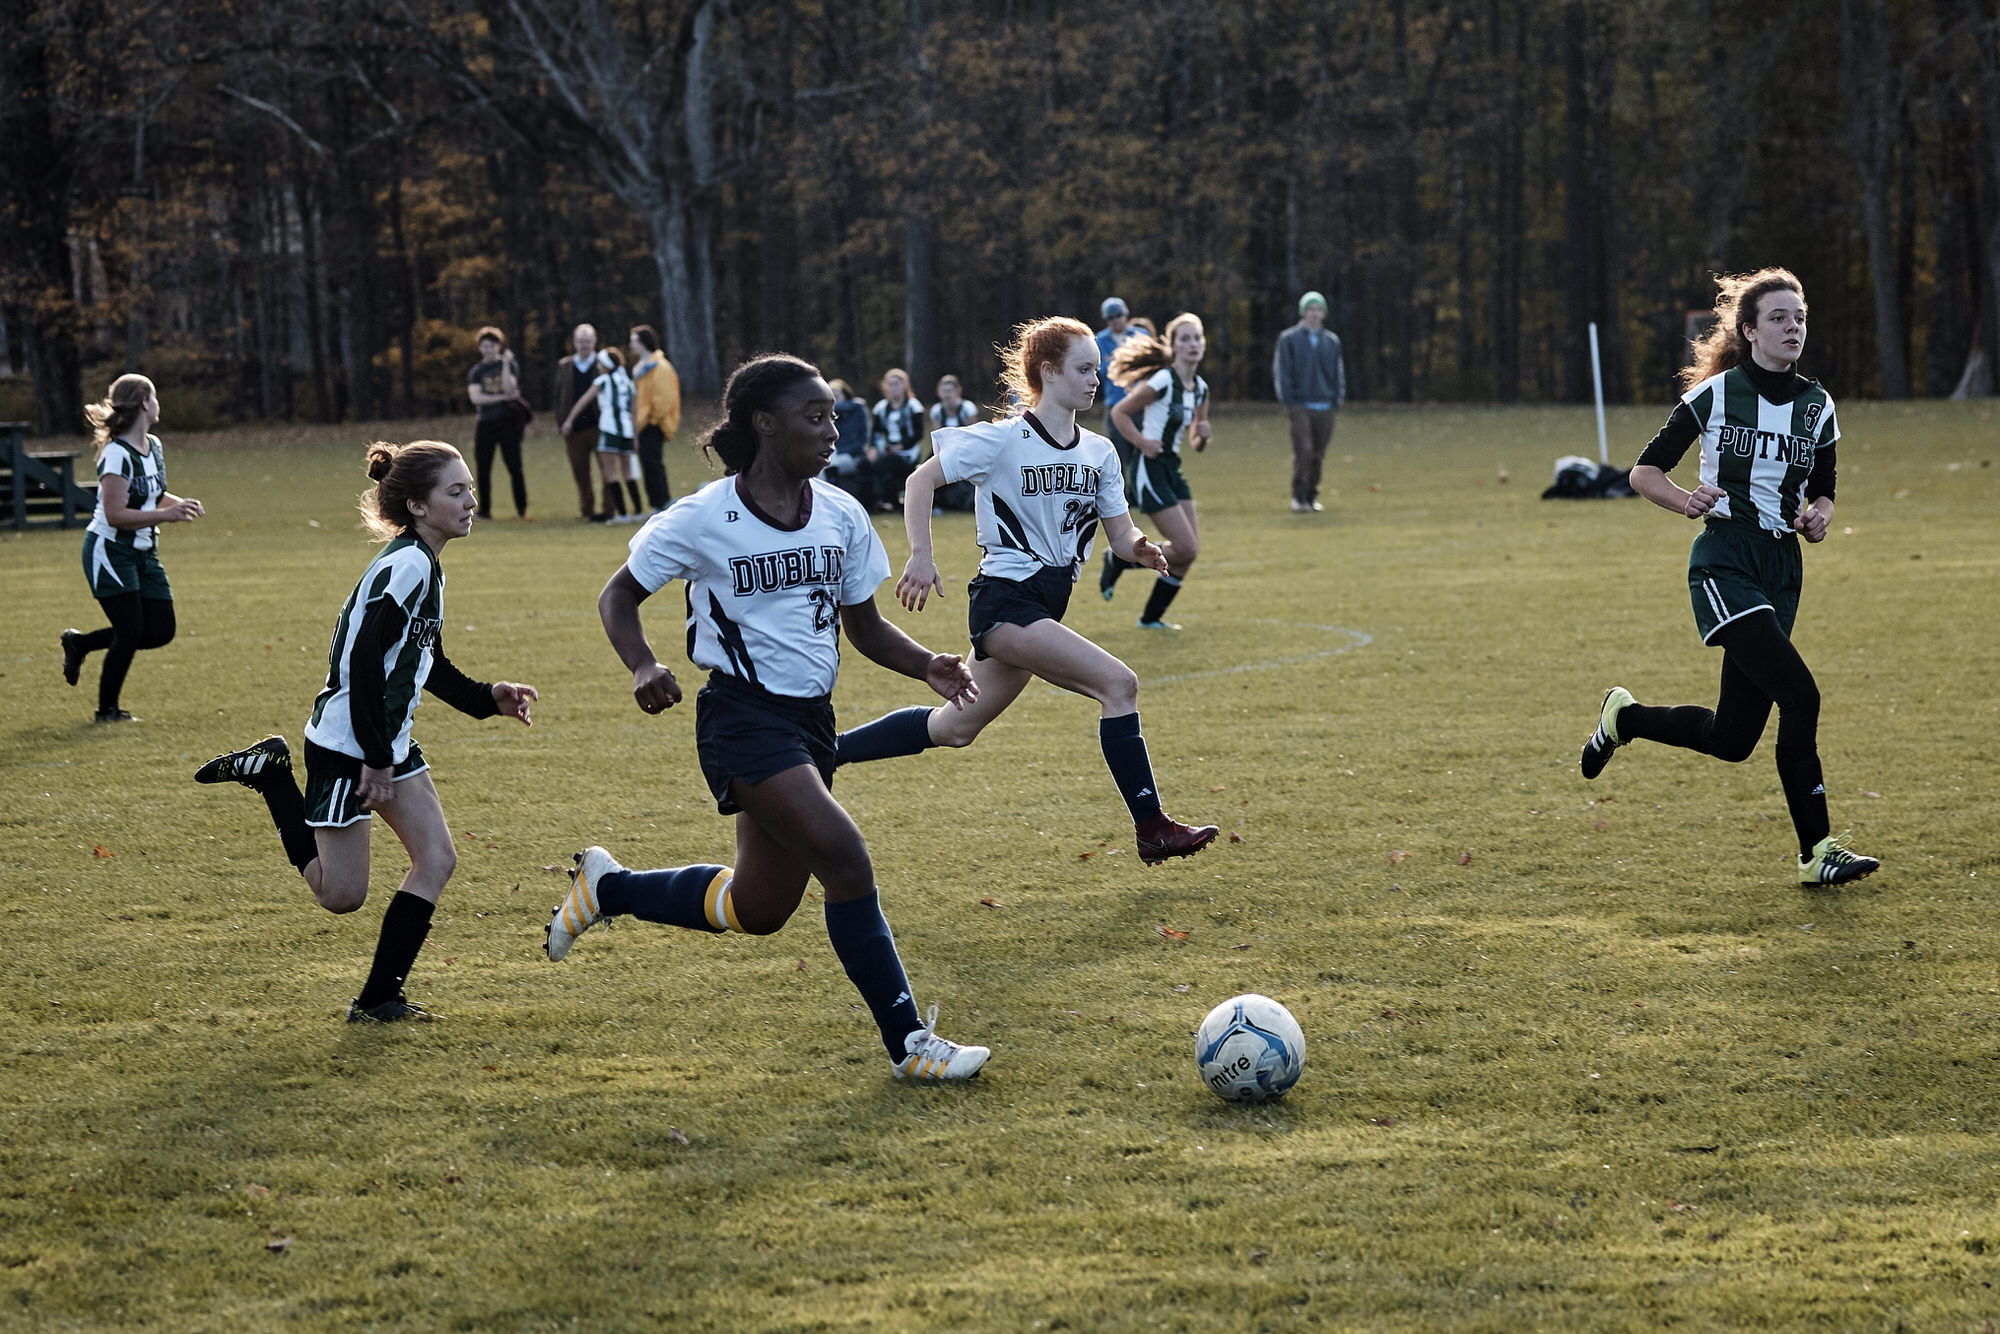 Girls Varsity Soccer vs. Putney School - October 26, 2018 - 041.jpg